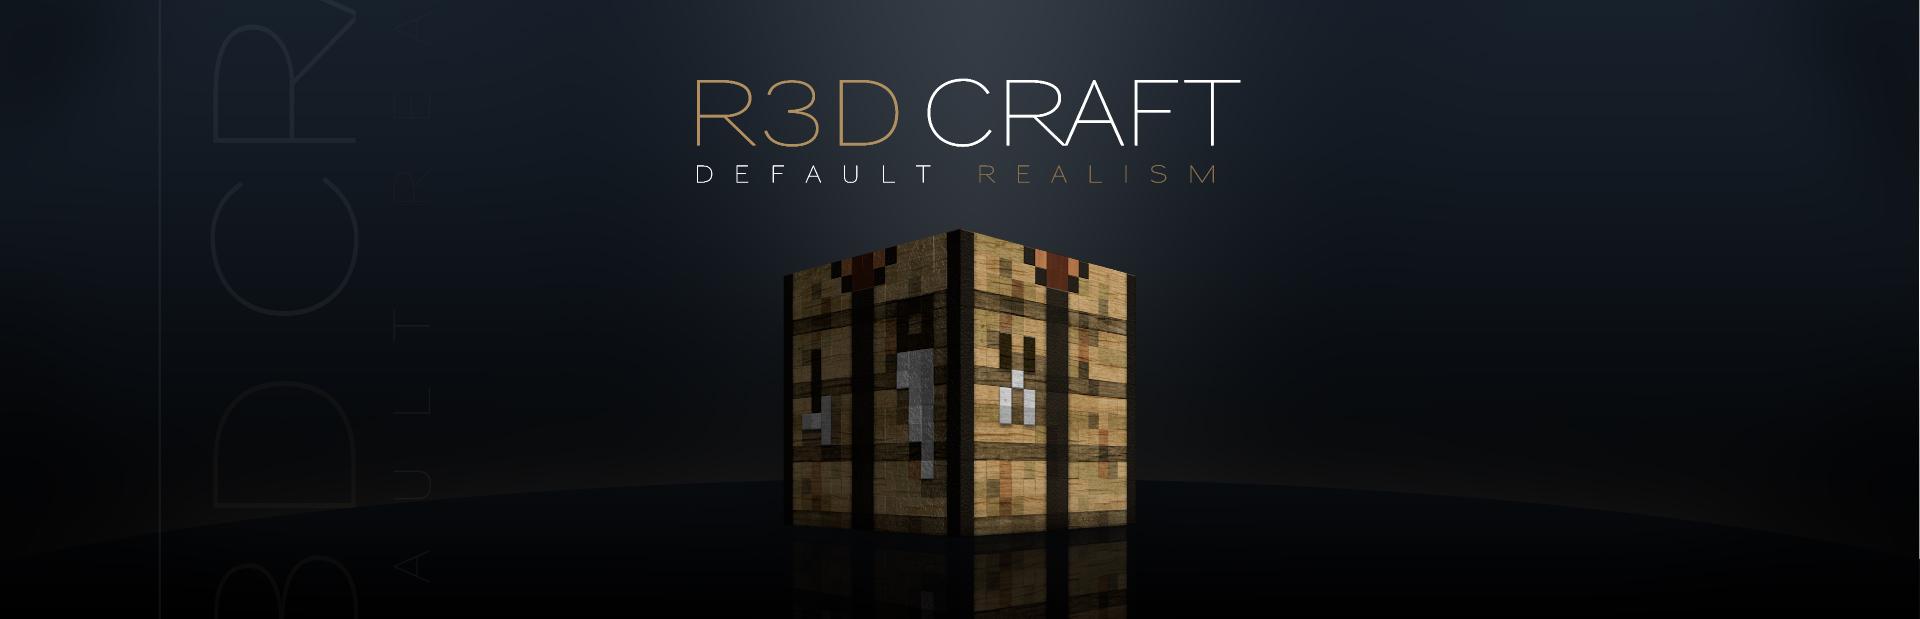 http://img.niceminecraft.net/TexturePack/R3D-Craft.jpg